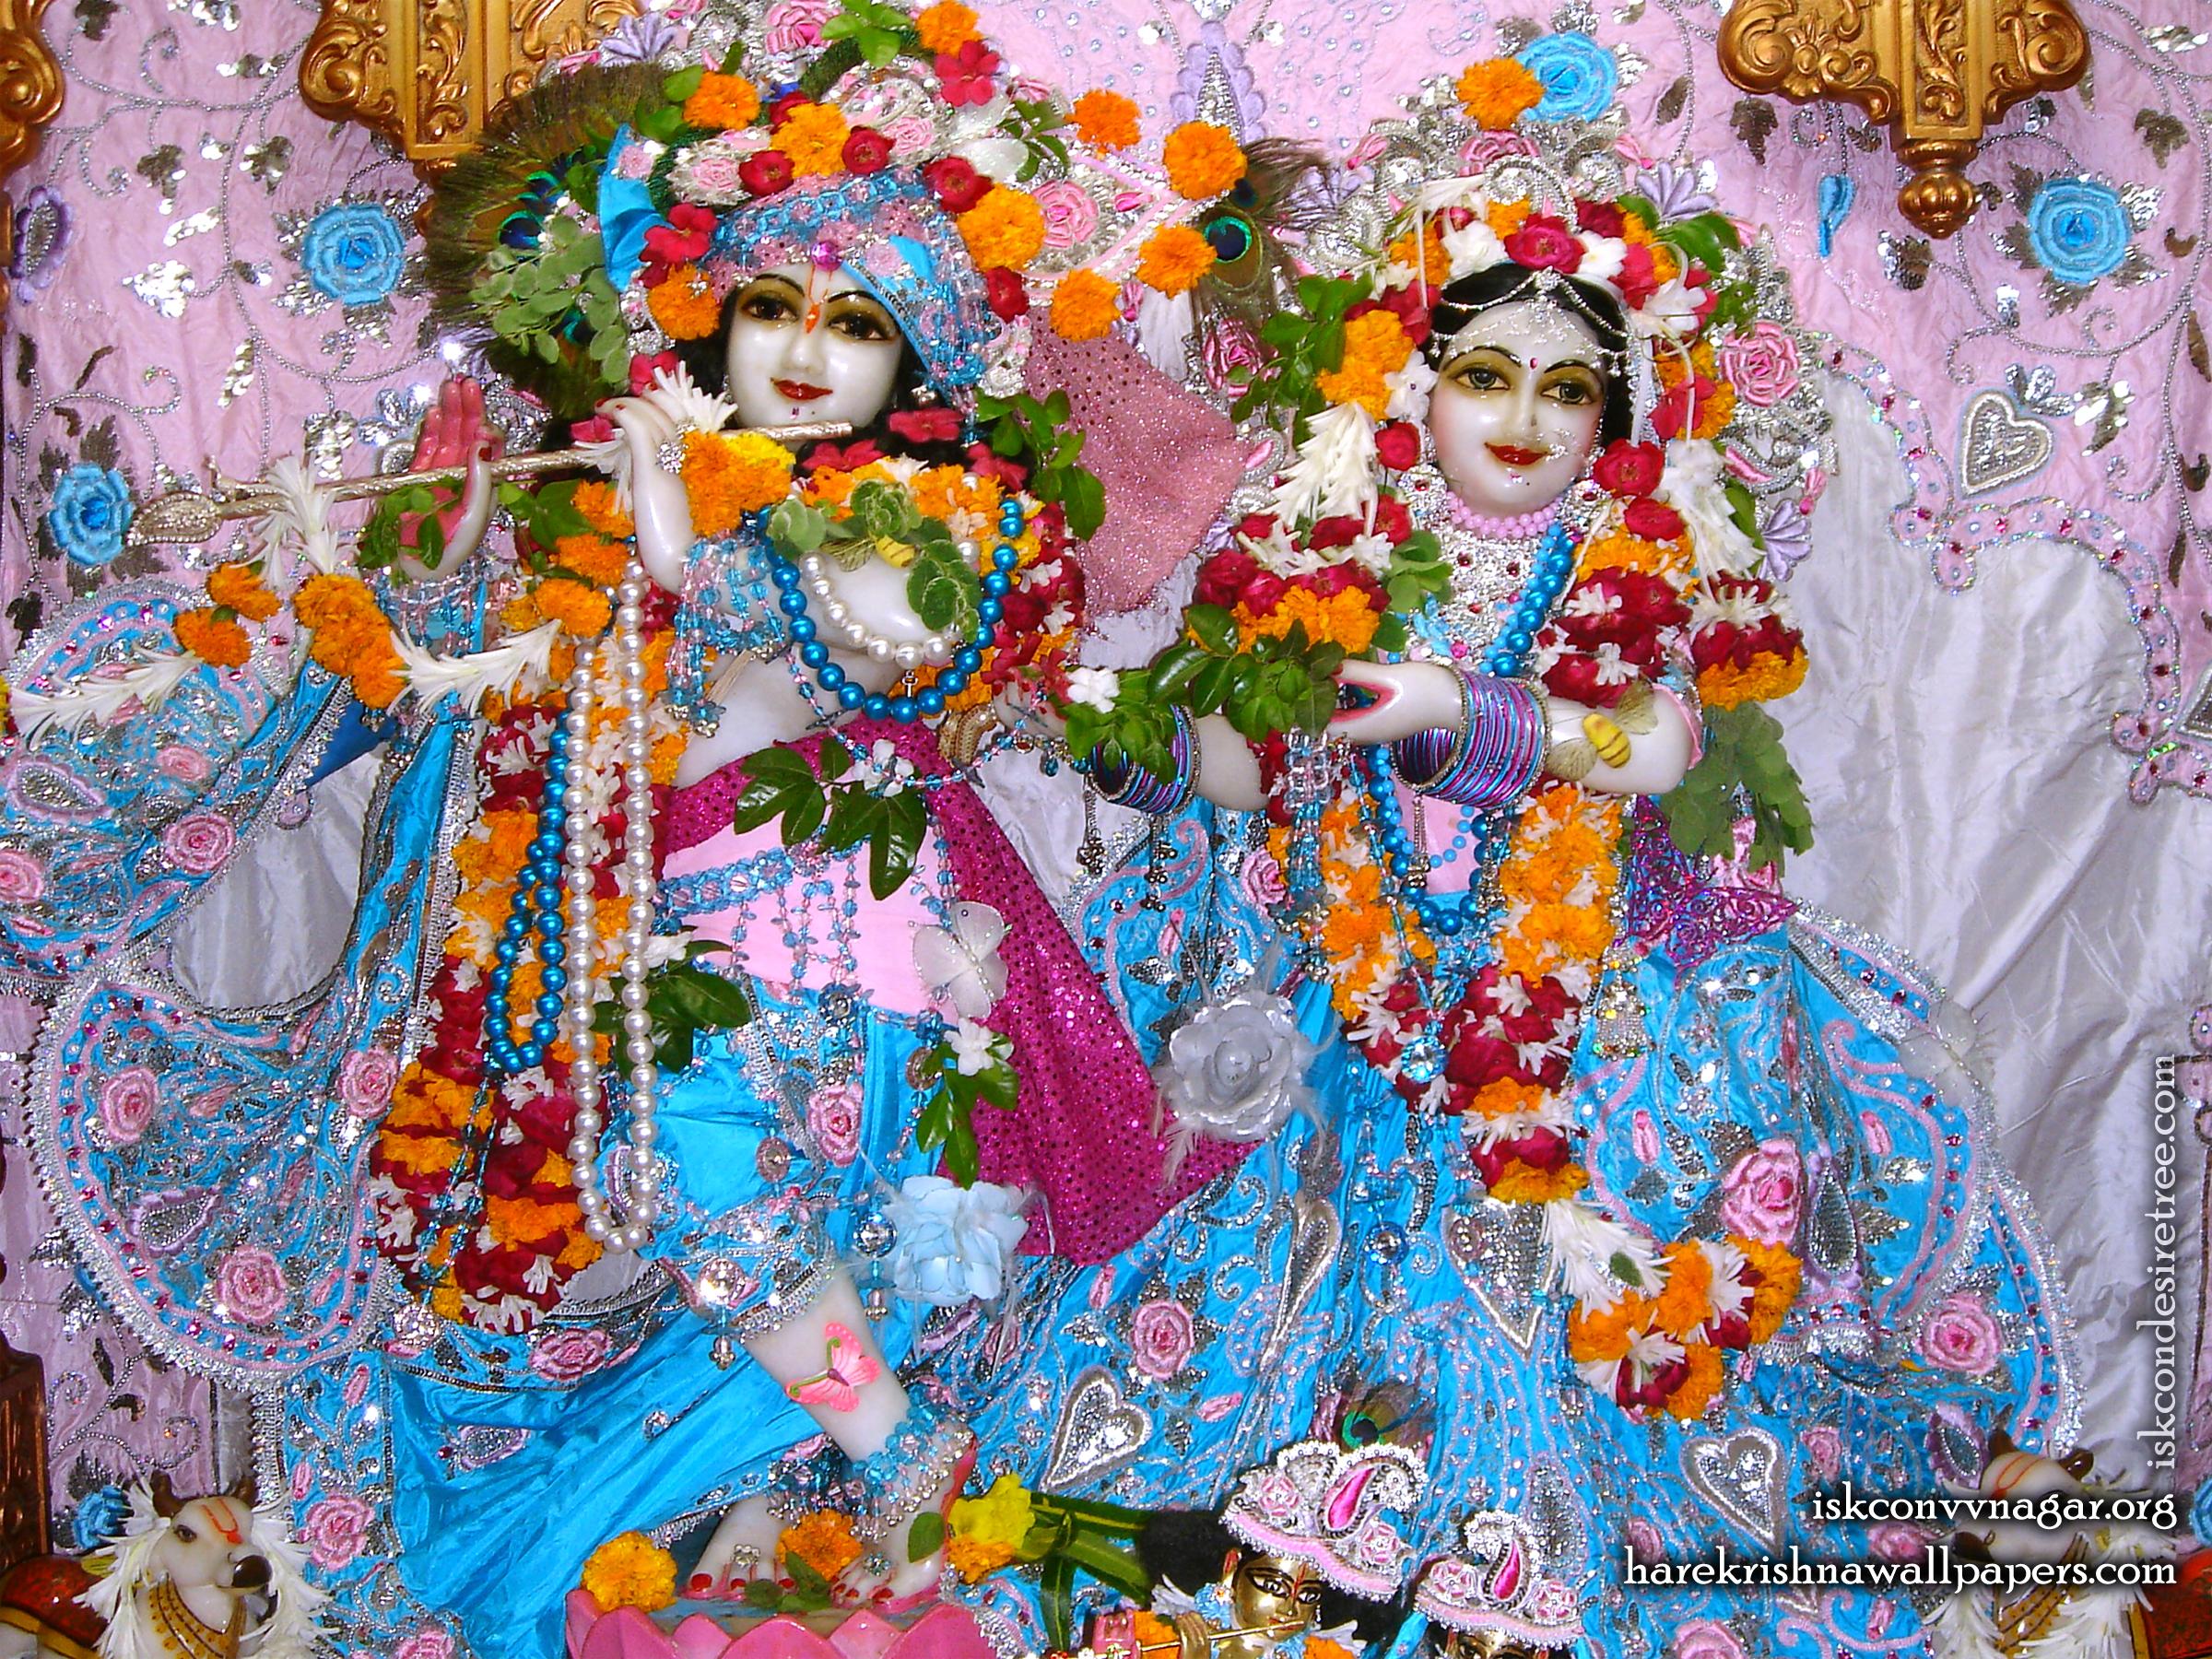 Sri Sri Radha Giridhari Wallpaper (019) Size 2400x1800 Download